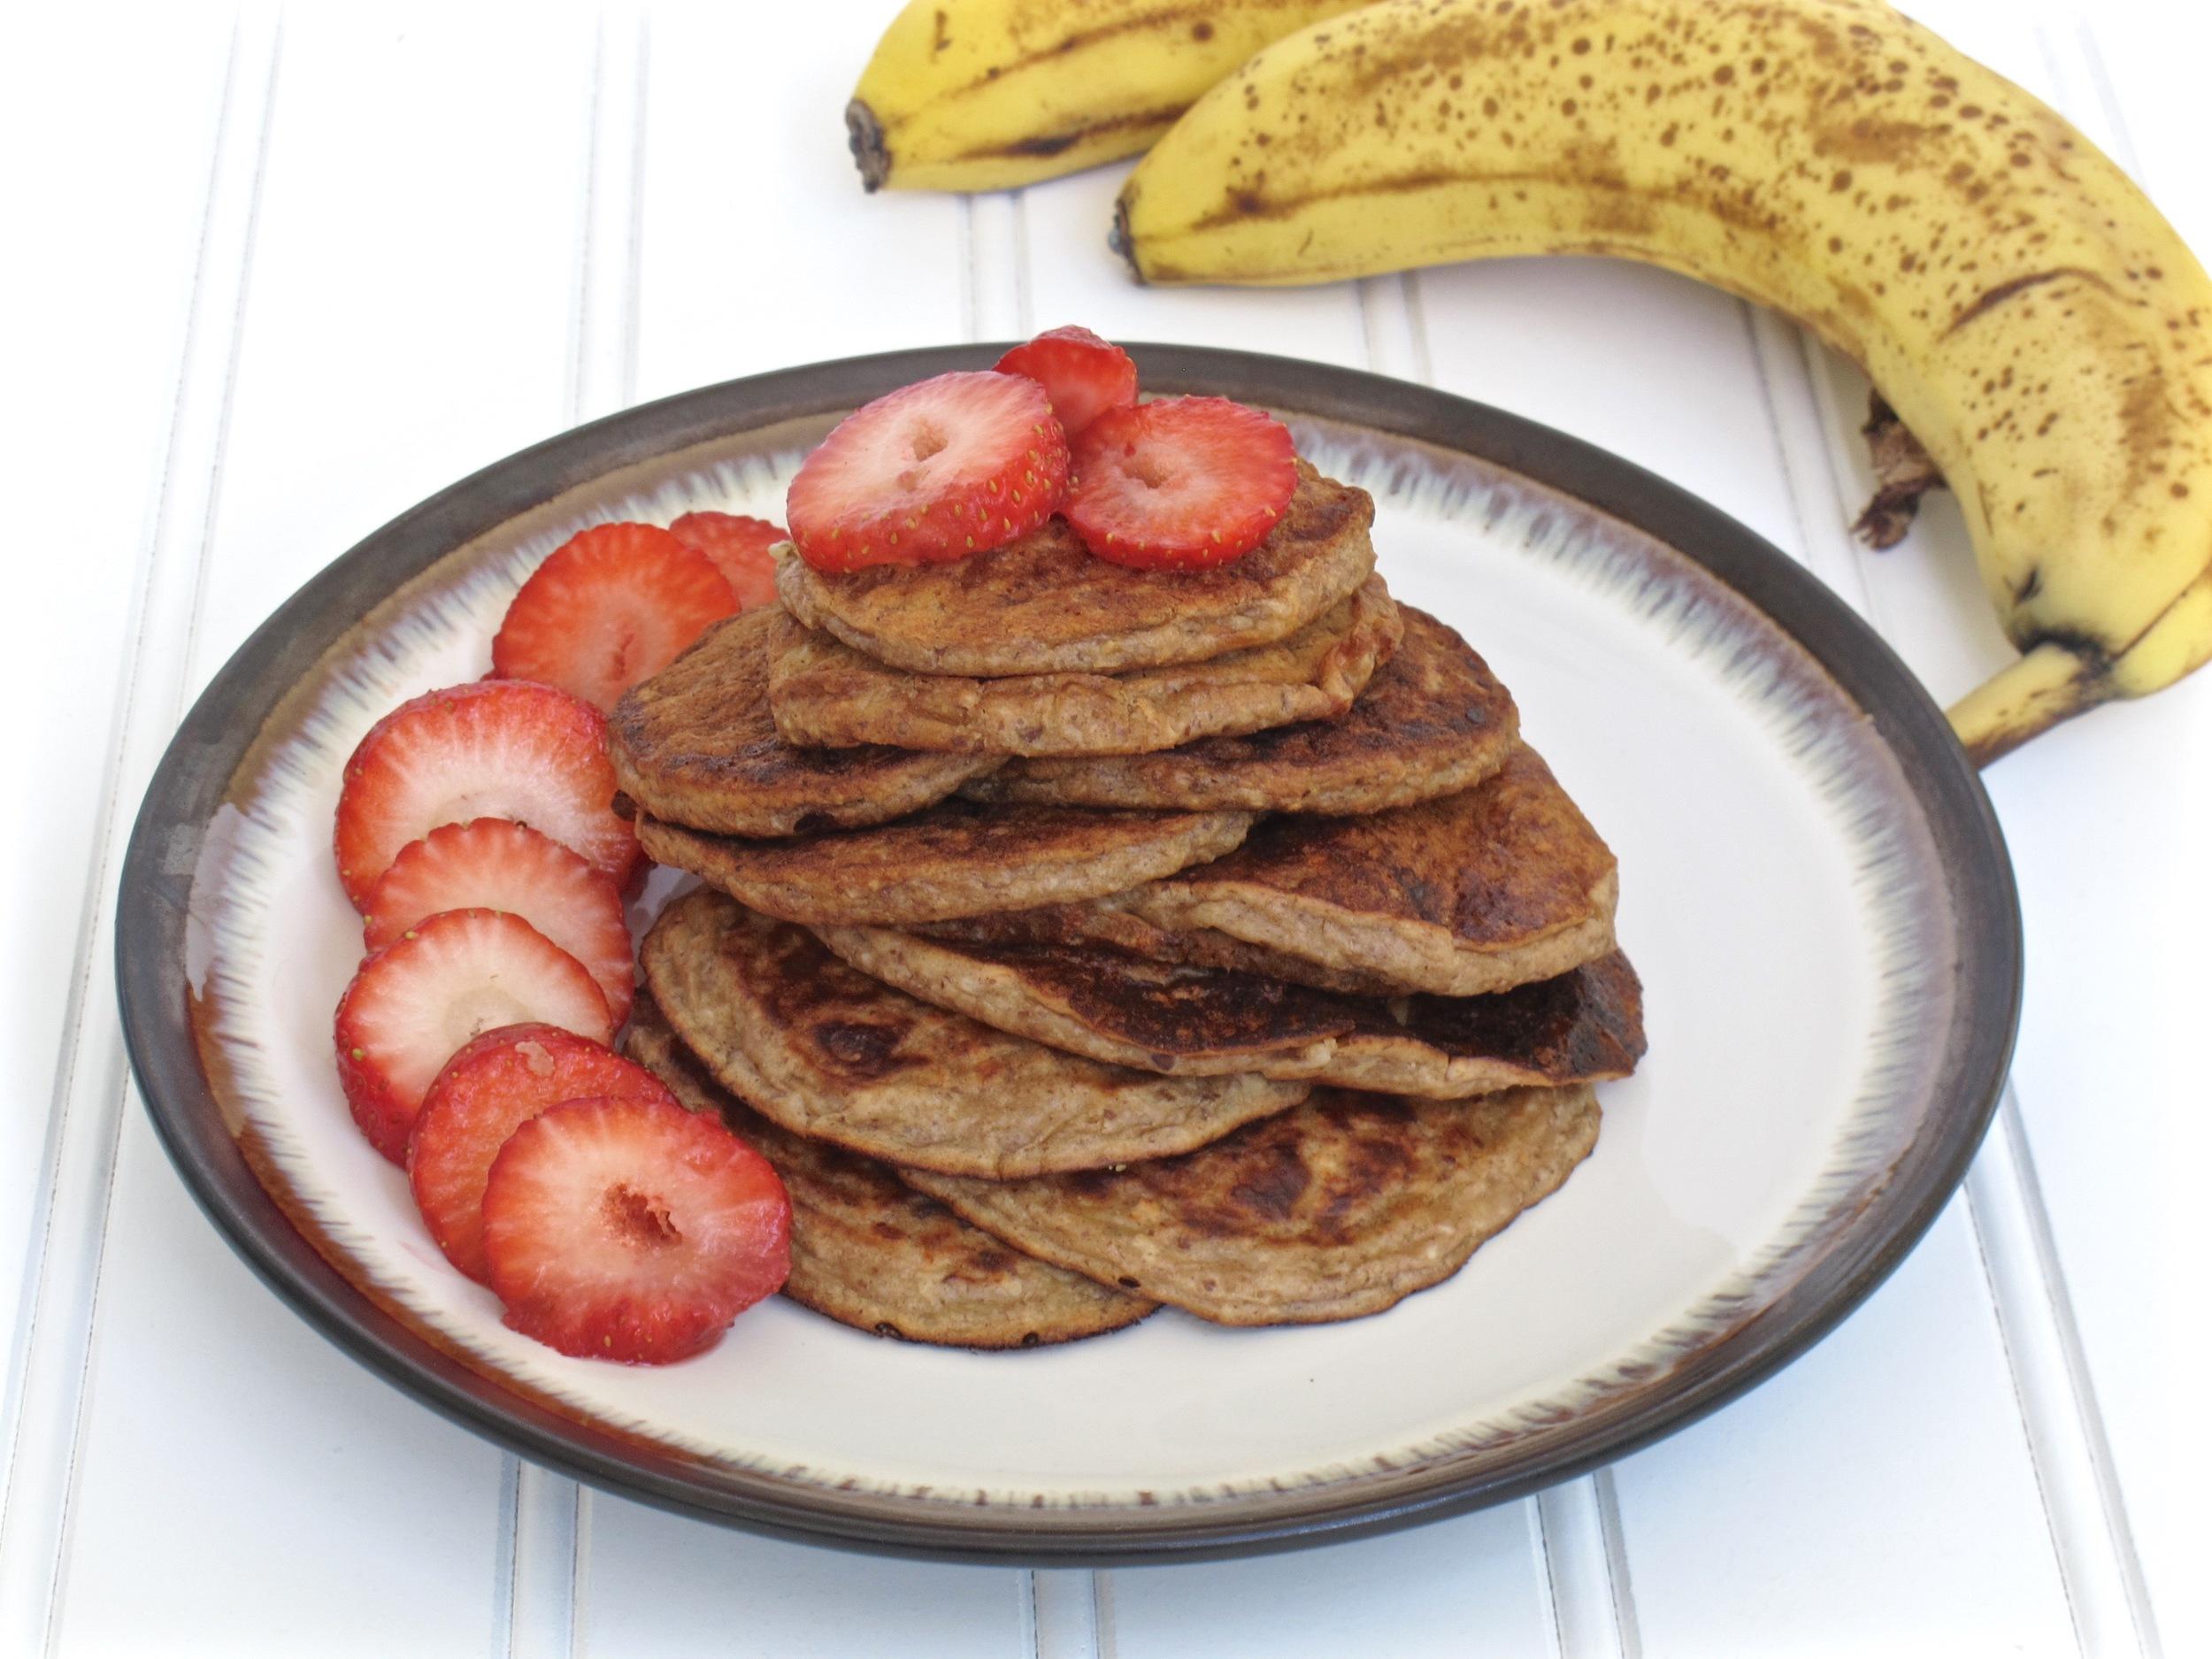 Banana Peanut Butter Pancakes gluten free and vegan